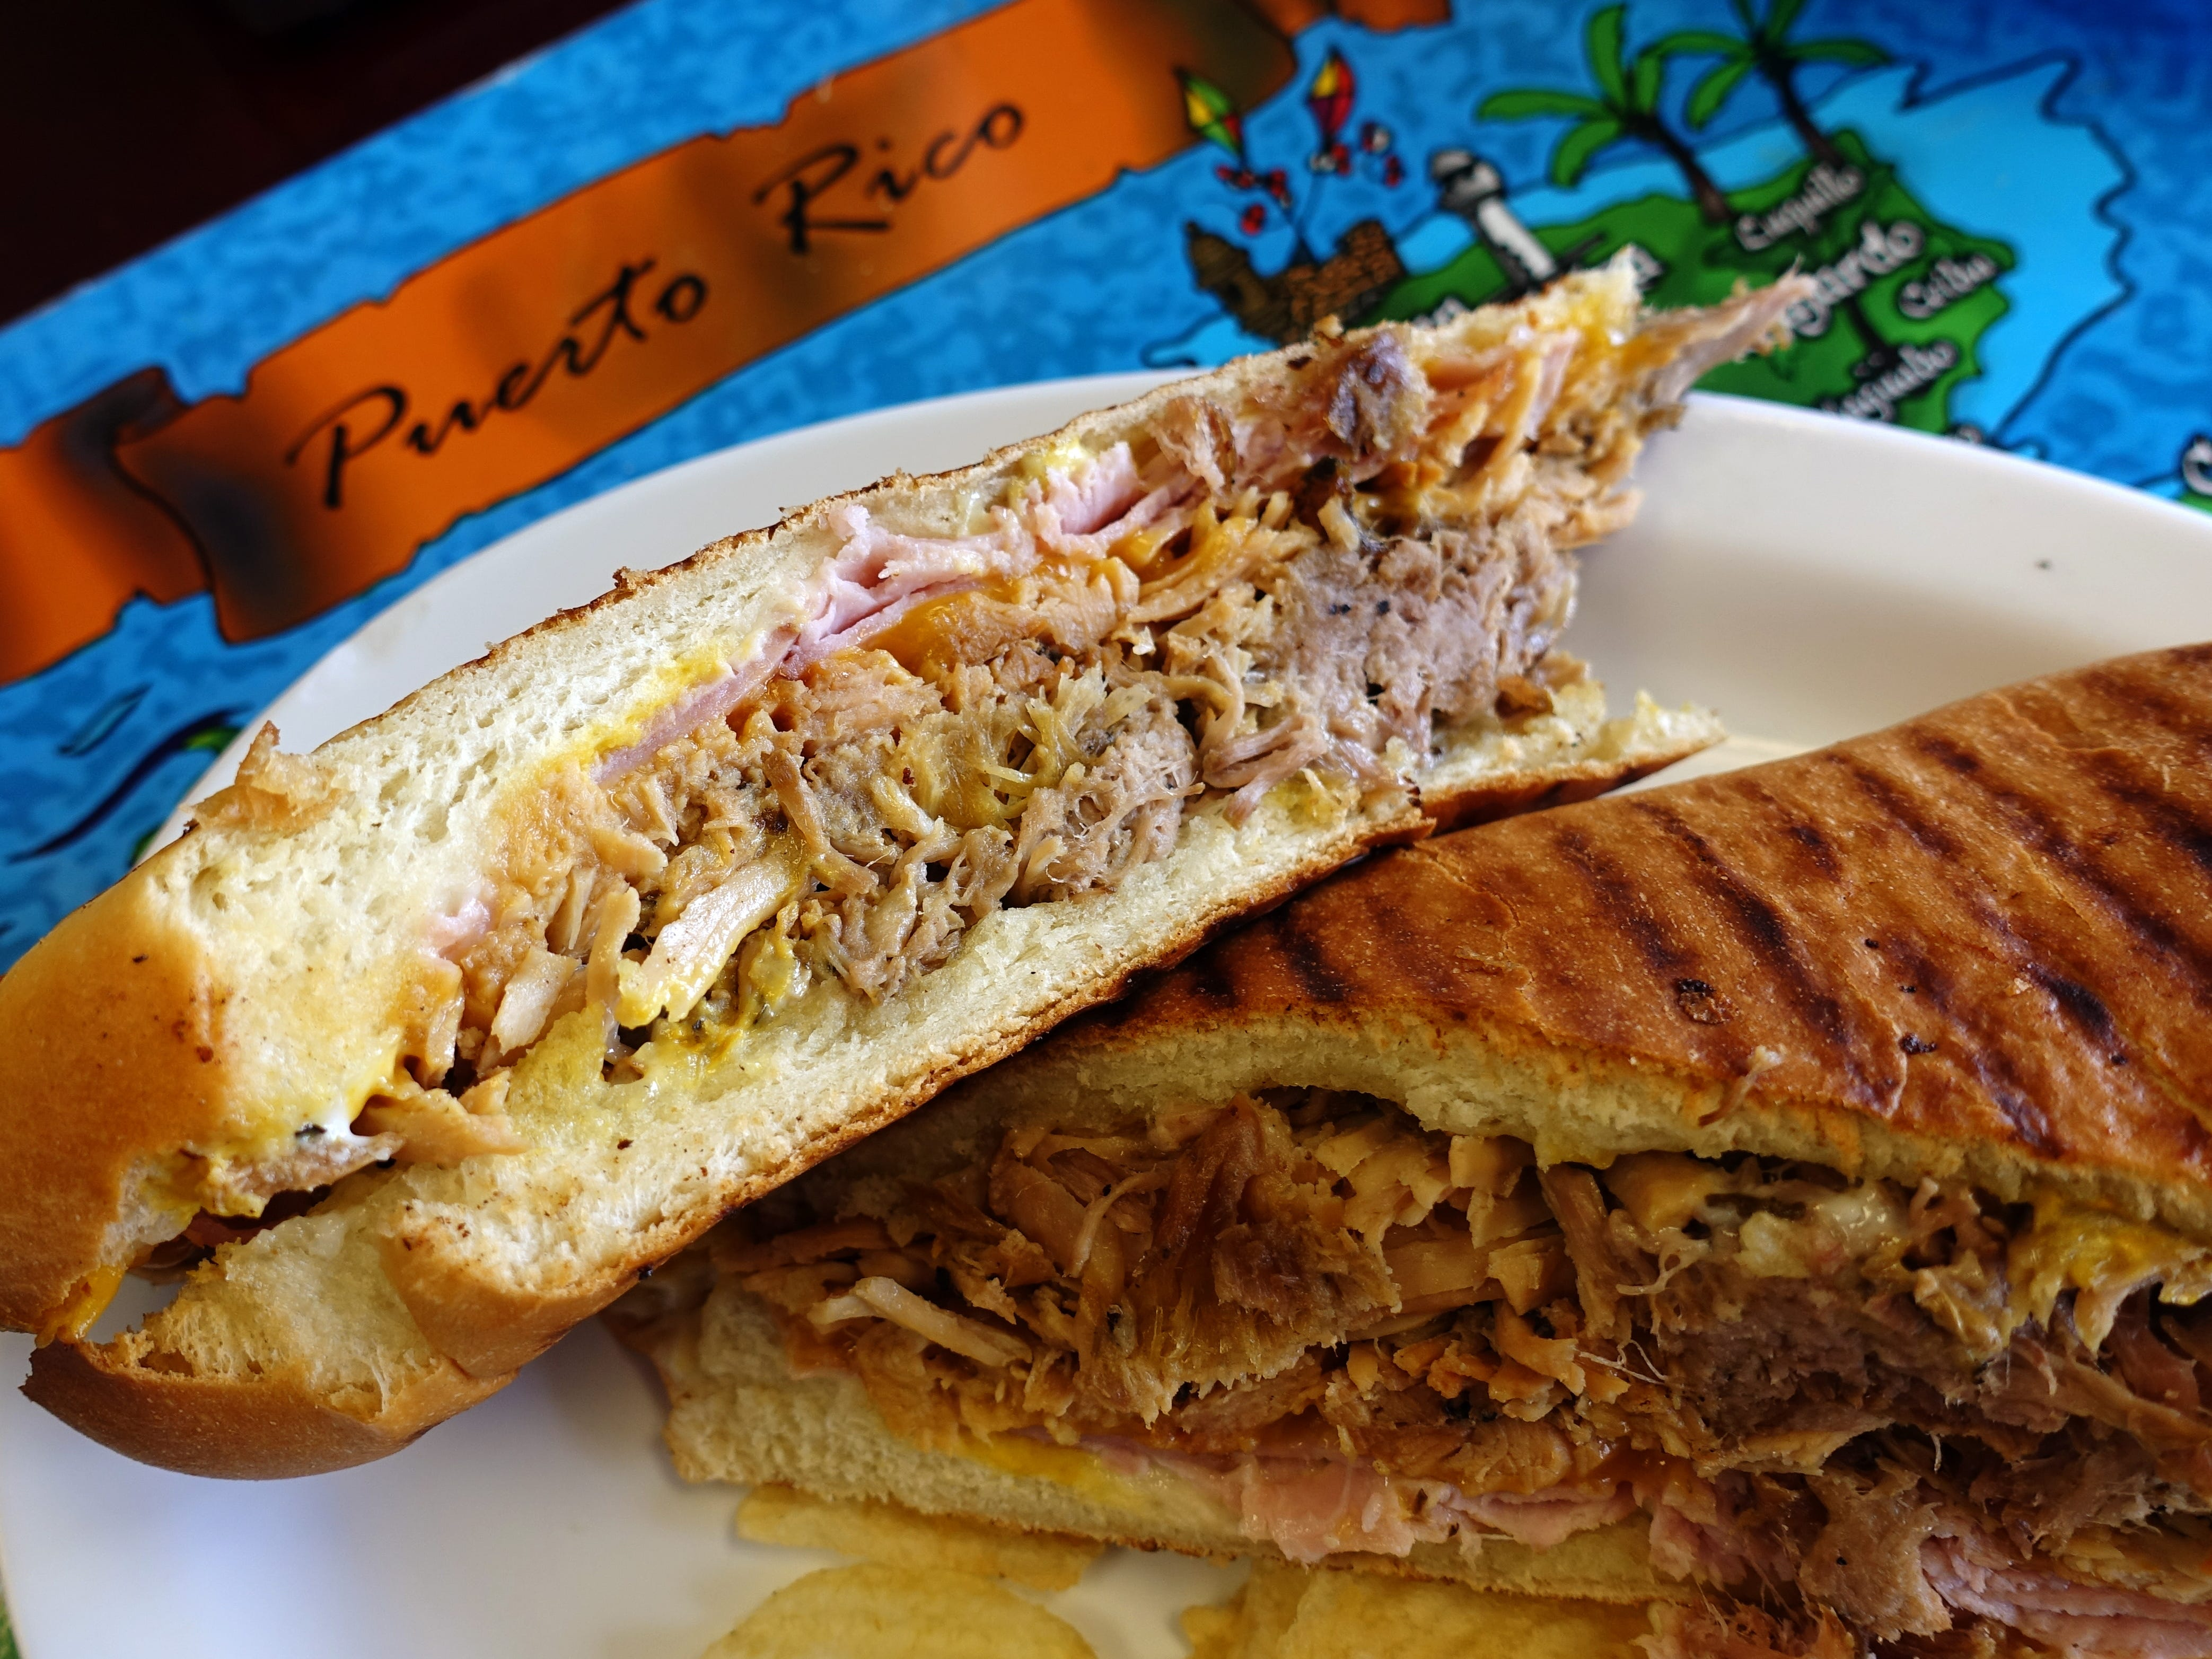 Tripleta sandwich with ham, roasted pork, roasted turkey and cheddar at Sweet Land Cake in Phoenix.